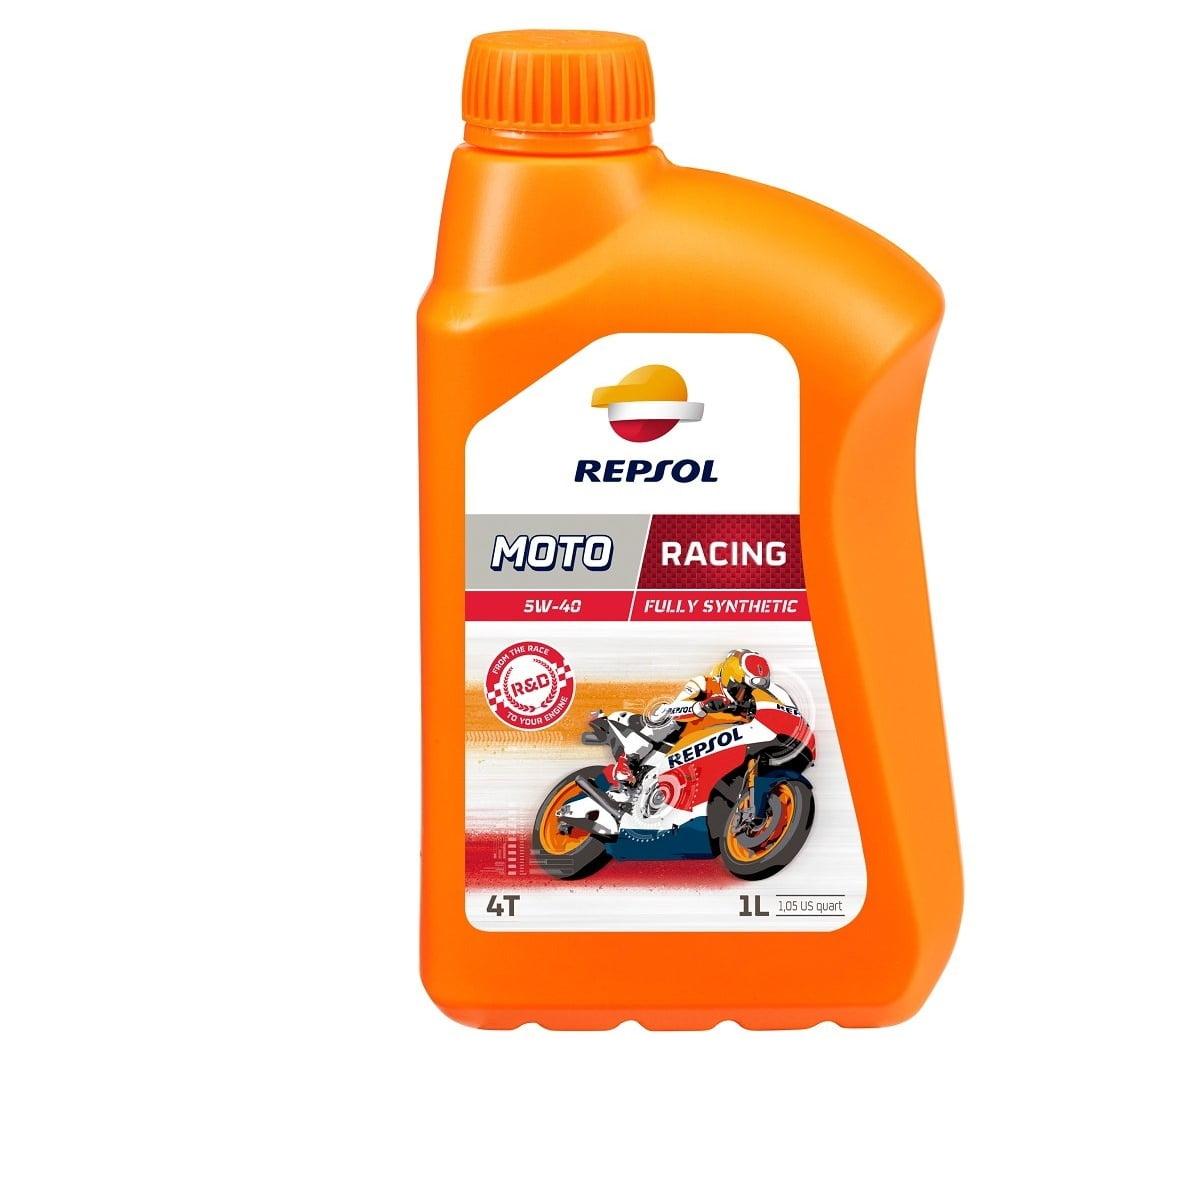 Oleo Repsol Moto Racing 5w40 4T Sintético 1lt em até 6x sem juros